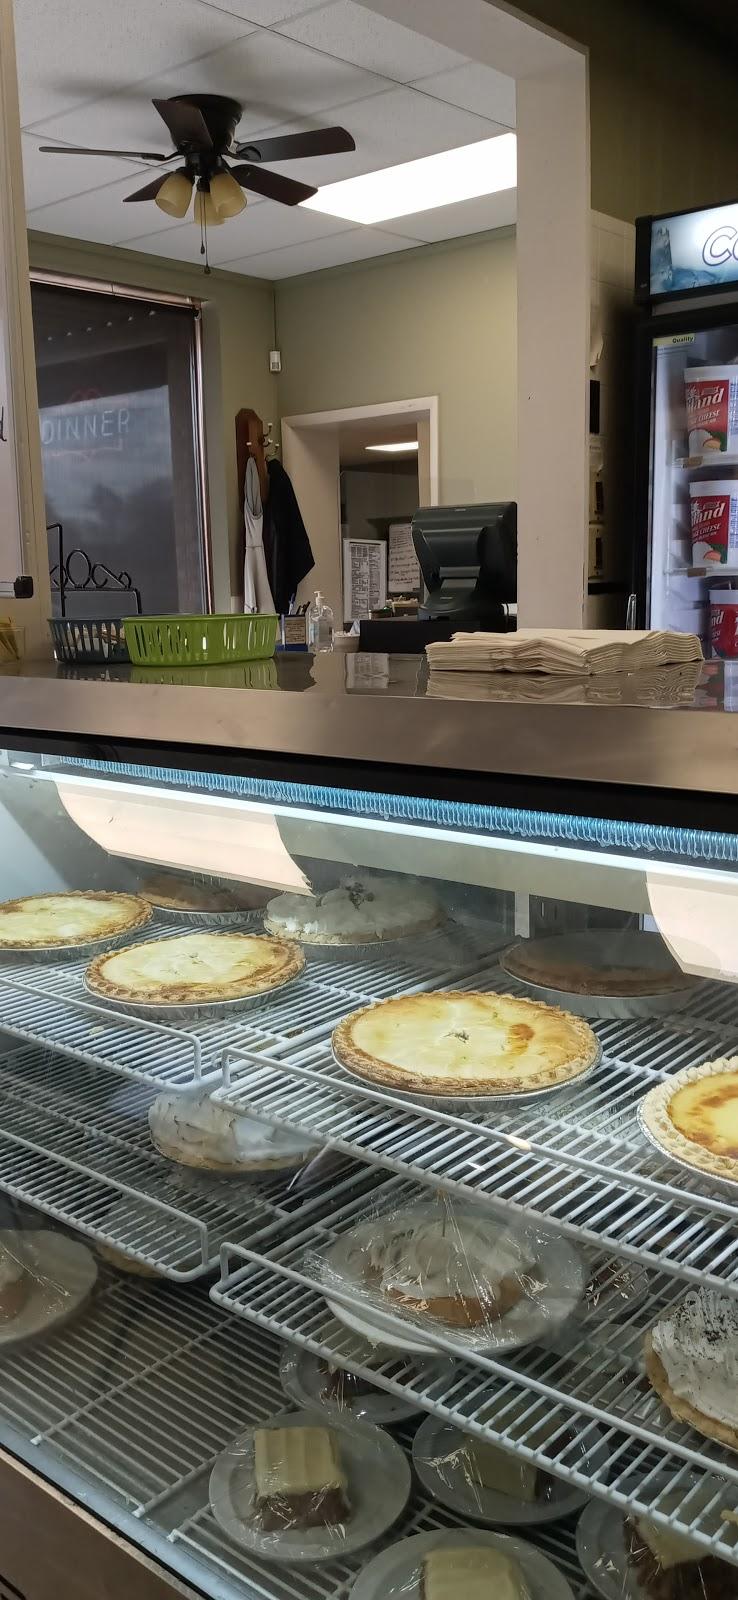 Englewood Cafe - cafe  | Photo 4 of 10 | Address: 10904 E Winner Rd, Independence, MO 64052, USA | Phone: (816) 461-9588